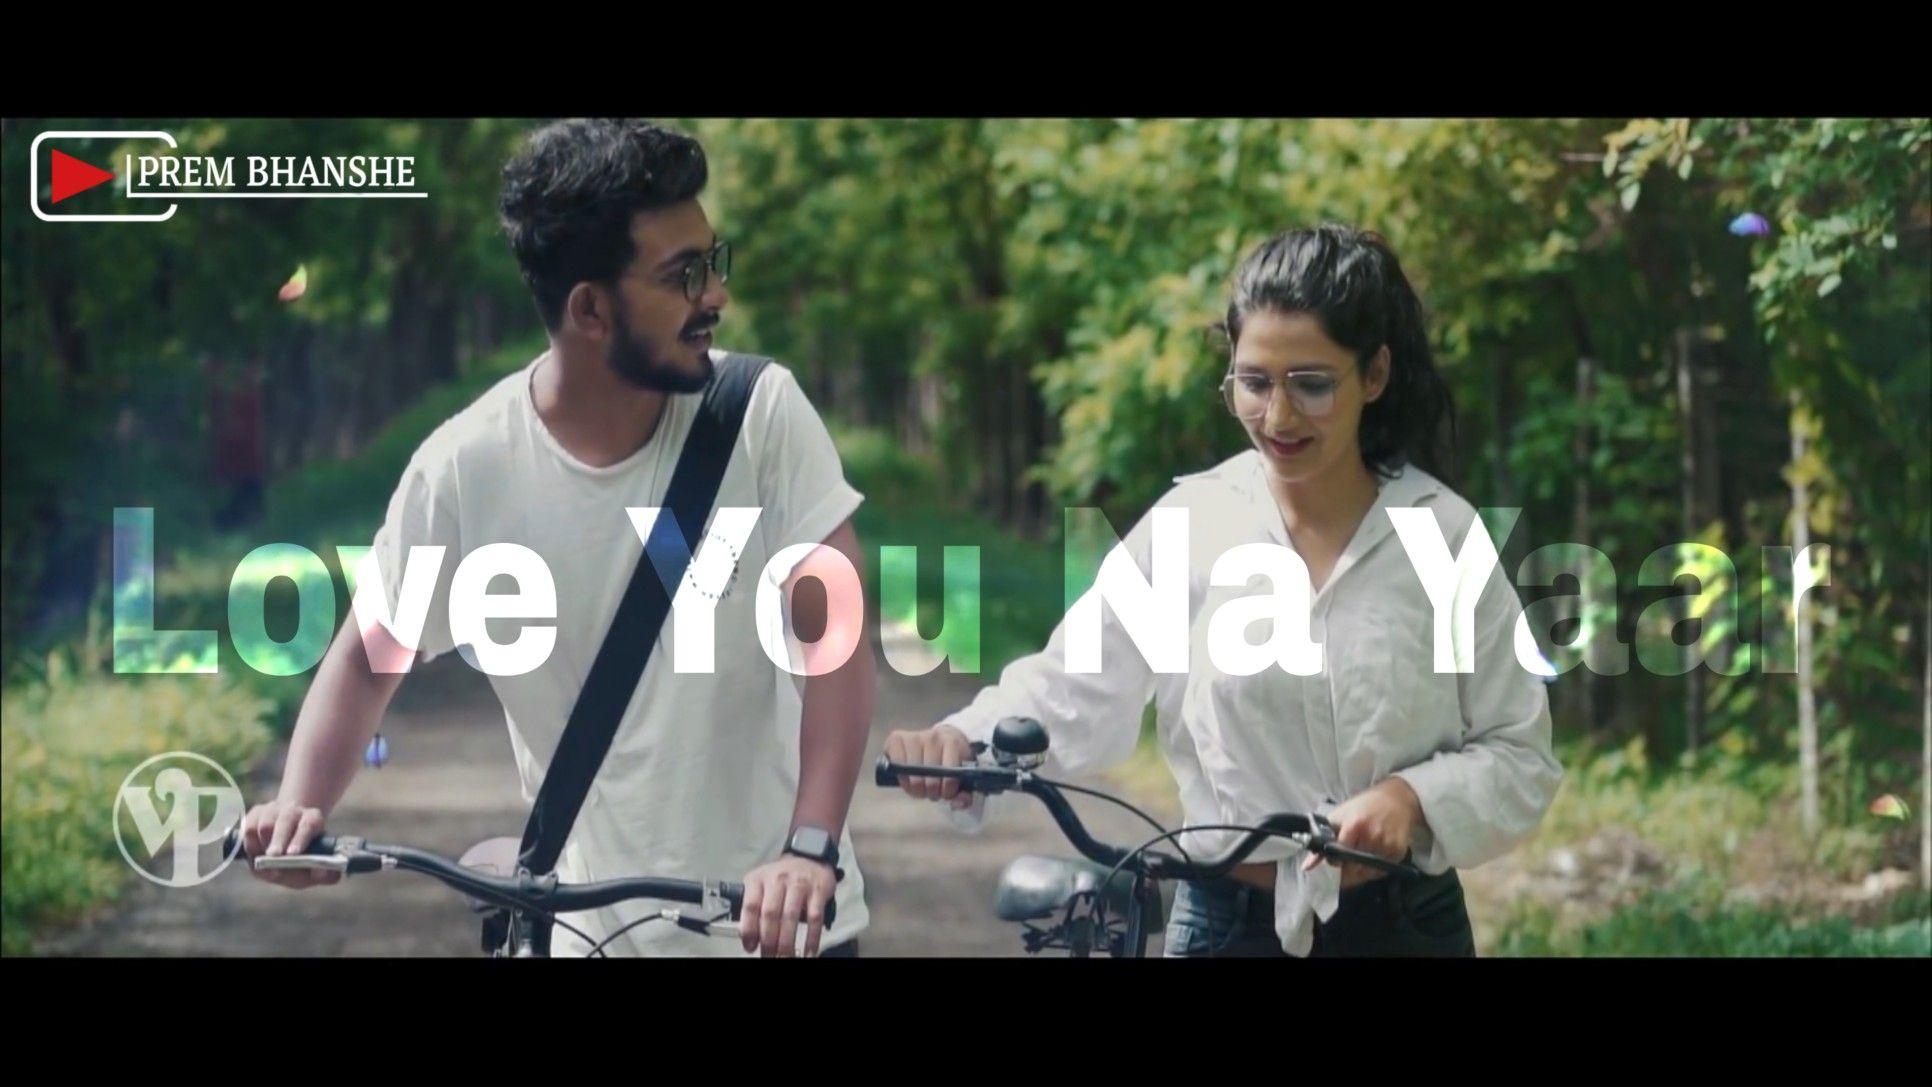 Love You Na Yaar Whatsapp Status Marathi Song Sanju Rathod New Song Marathi Status Song Status Marathi Song News Songs